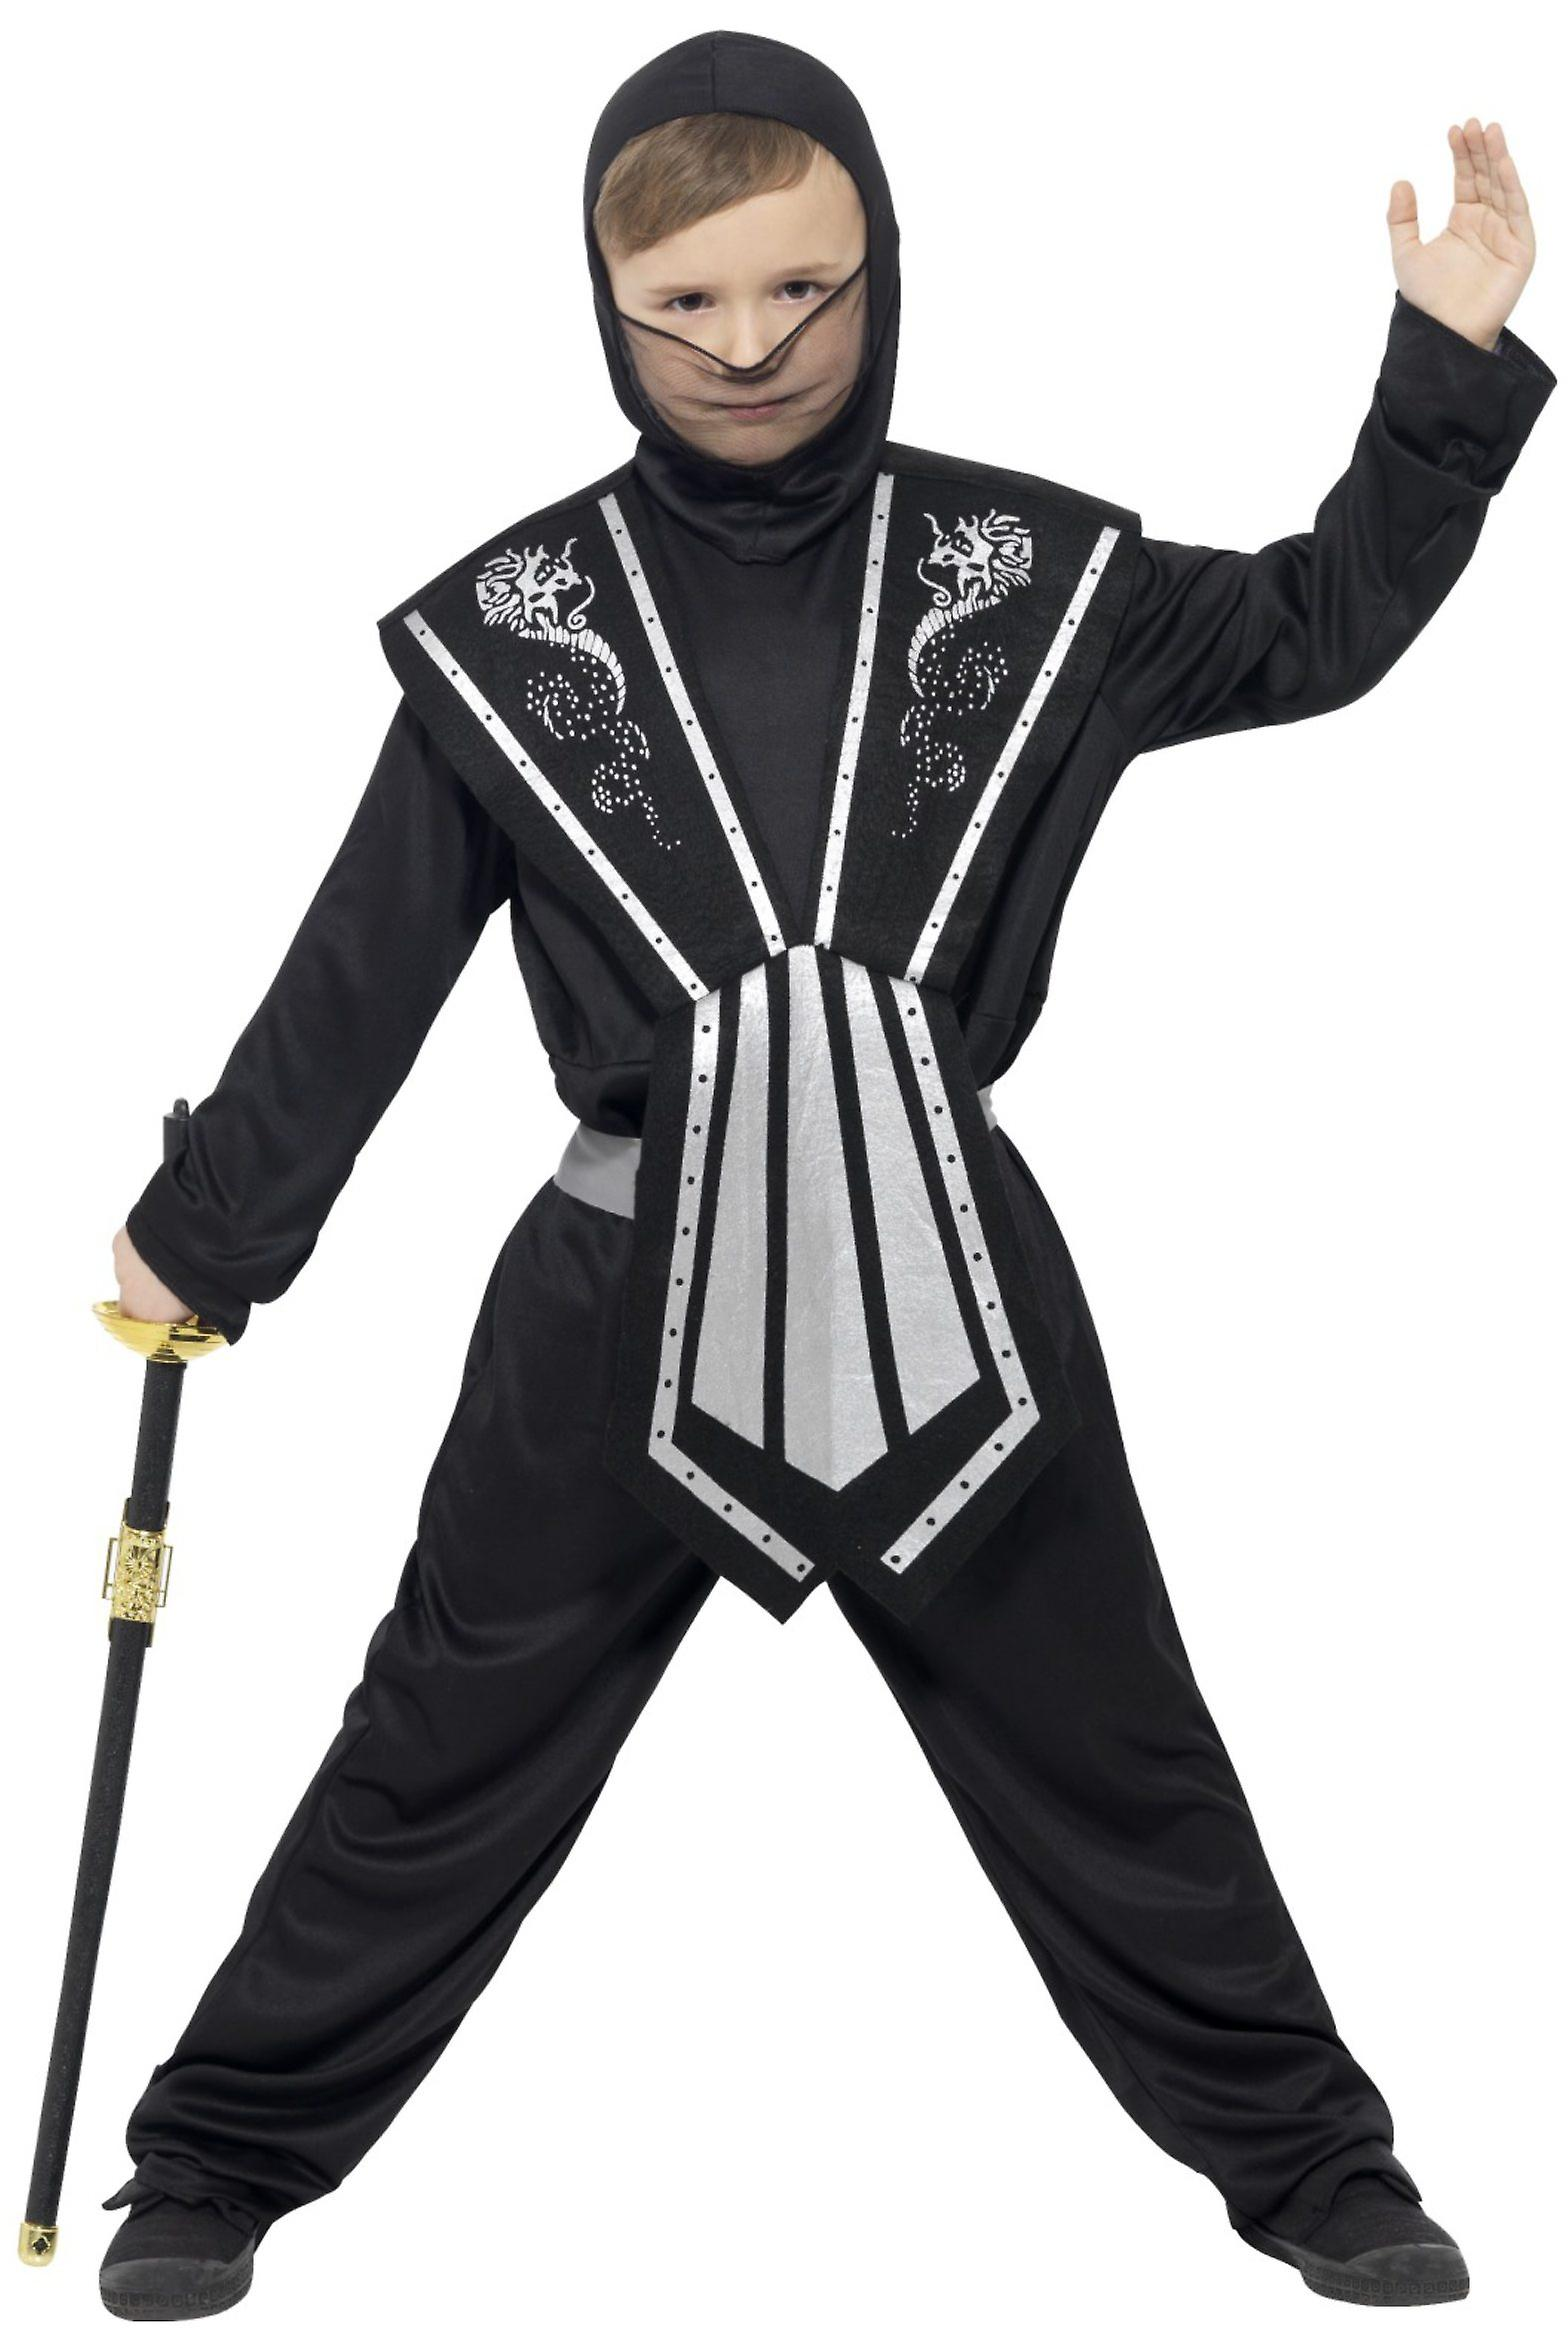 Faschingskostüme Für Kinder Kinder Ninja Kostüm Schwarz Silber Fruugo